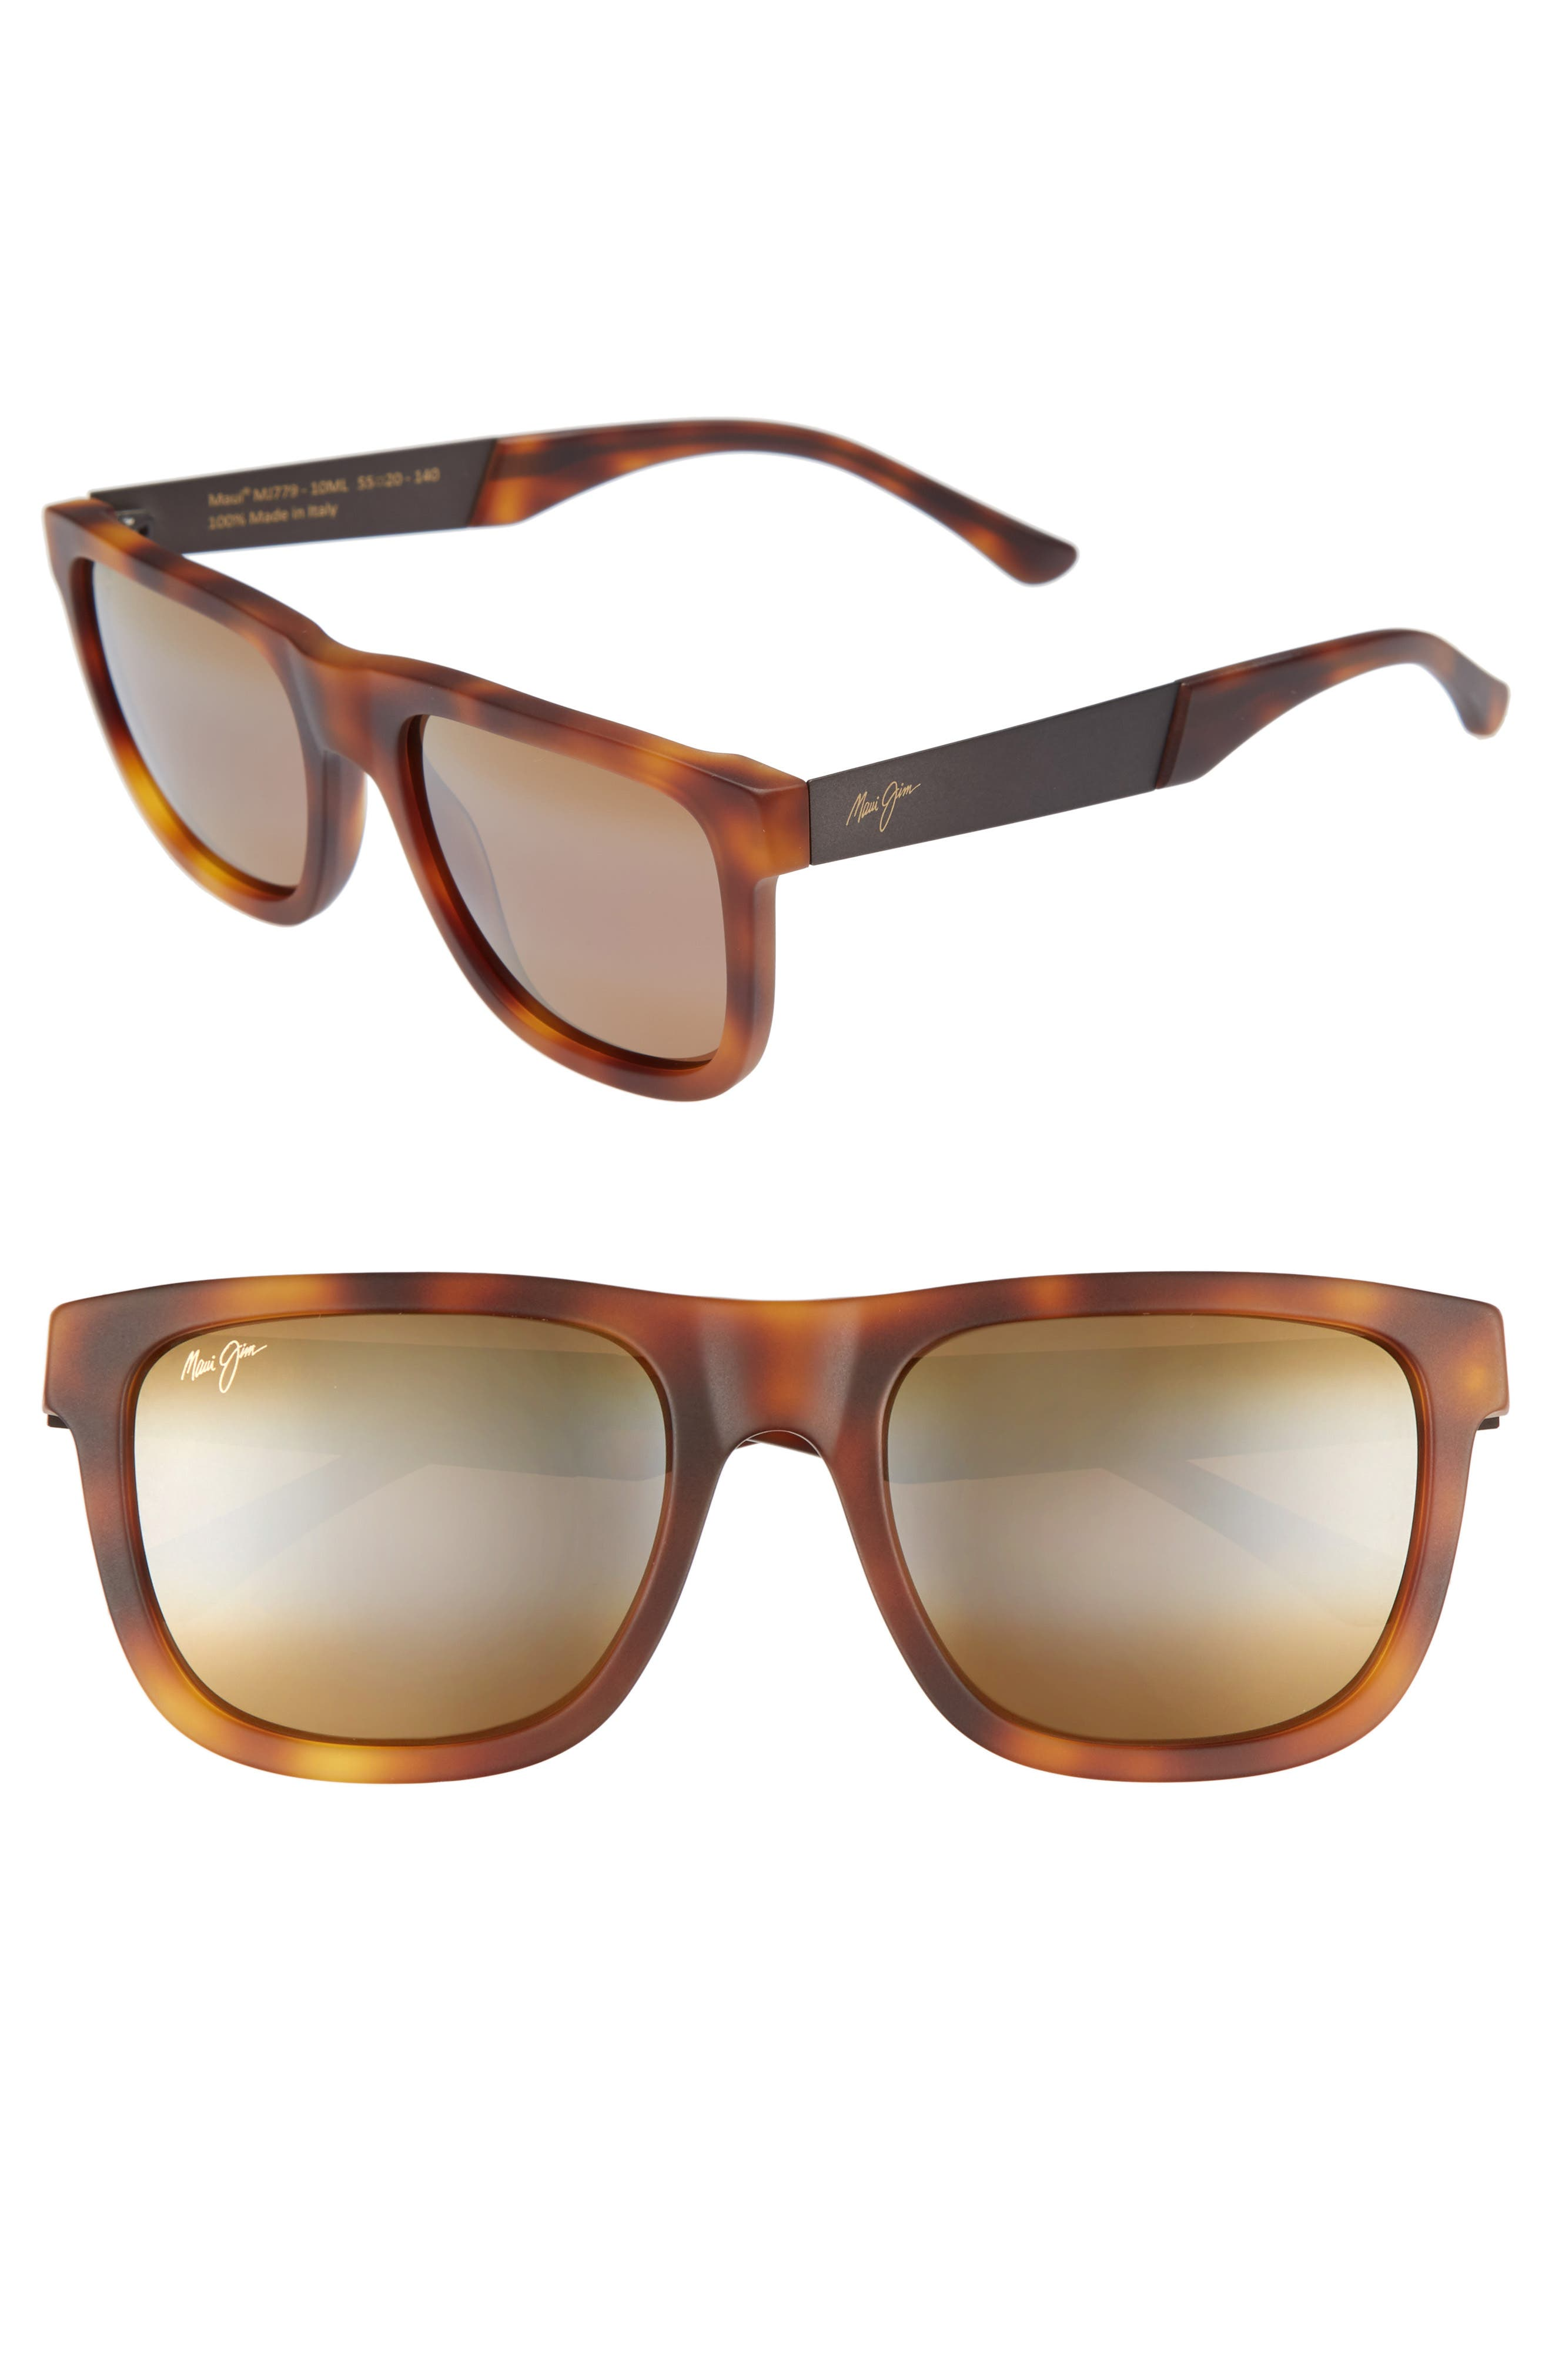 Maui Jim Talk Story Sonnenbrille Mattes Tokyo Tortoise 10ML Polarisiert 55mm 4mjYWD